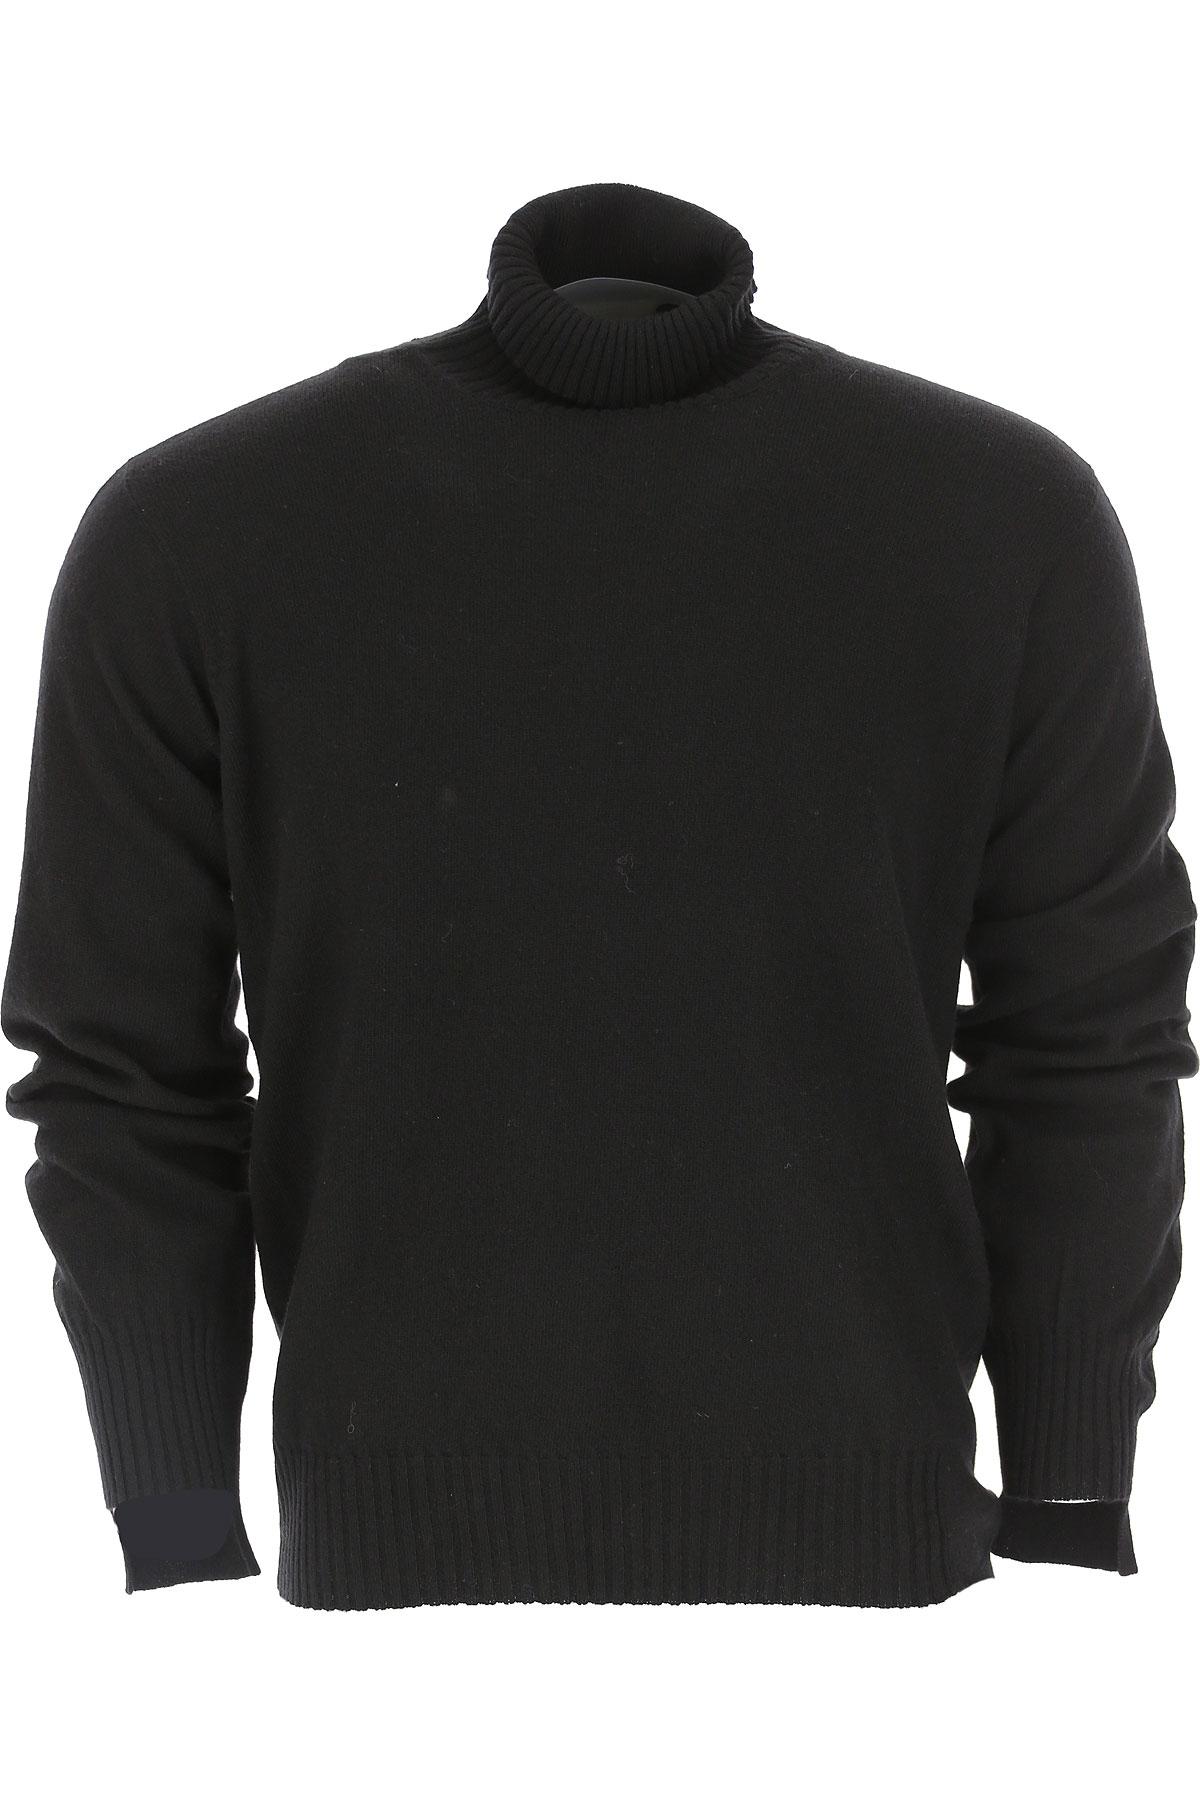 Maison Flaneur Sweater for Men Jumper On Sale, Black, Virgin wool, 2019, L M S XL